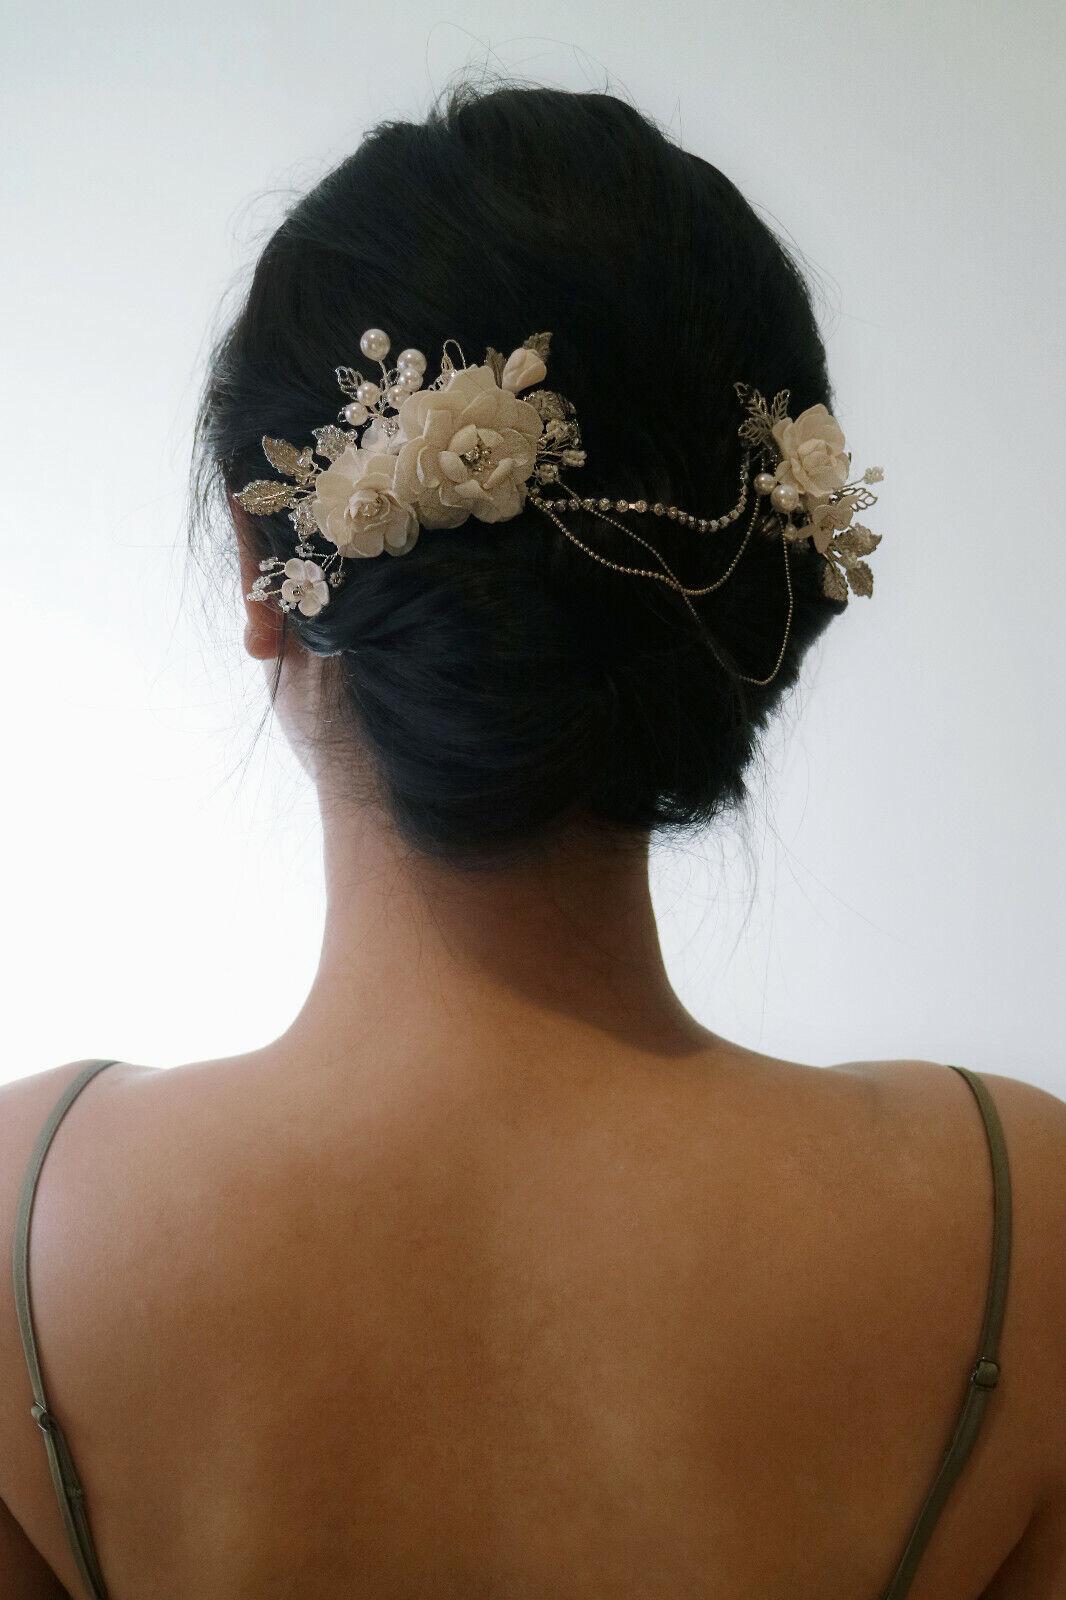 Dual Floral Headpiece w. Swarovski Crystals & Pearl in Silver | Handmade